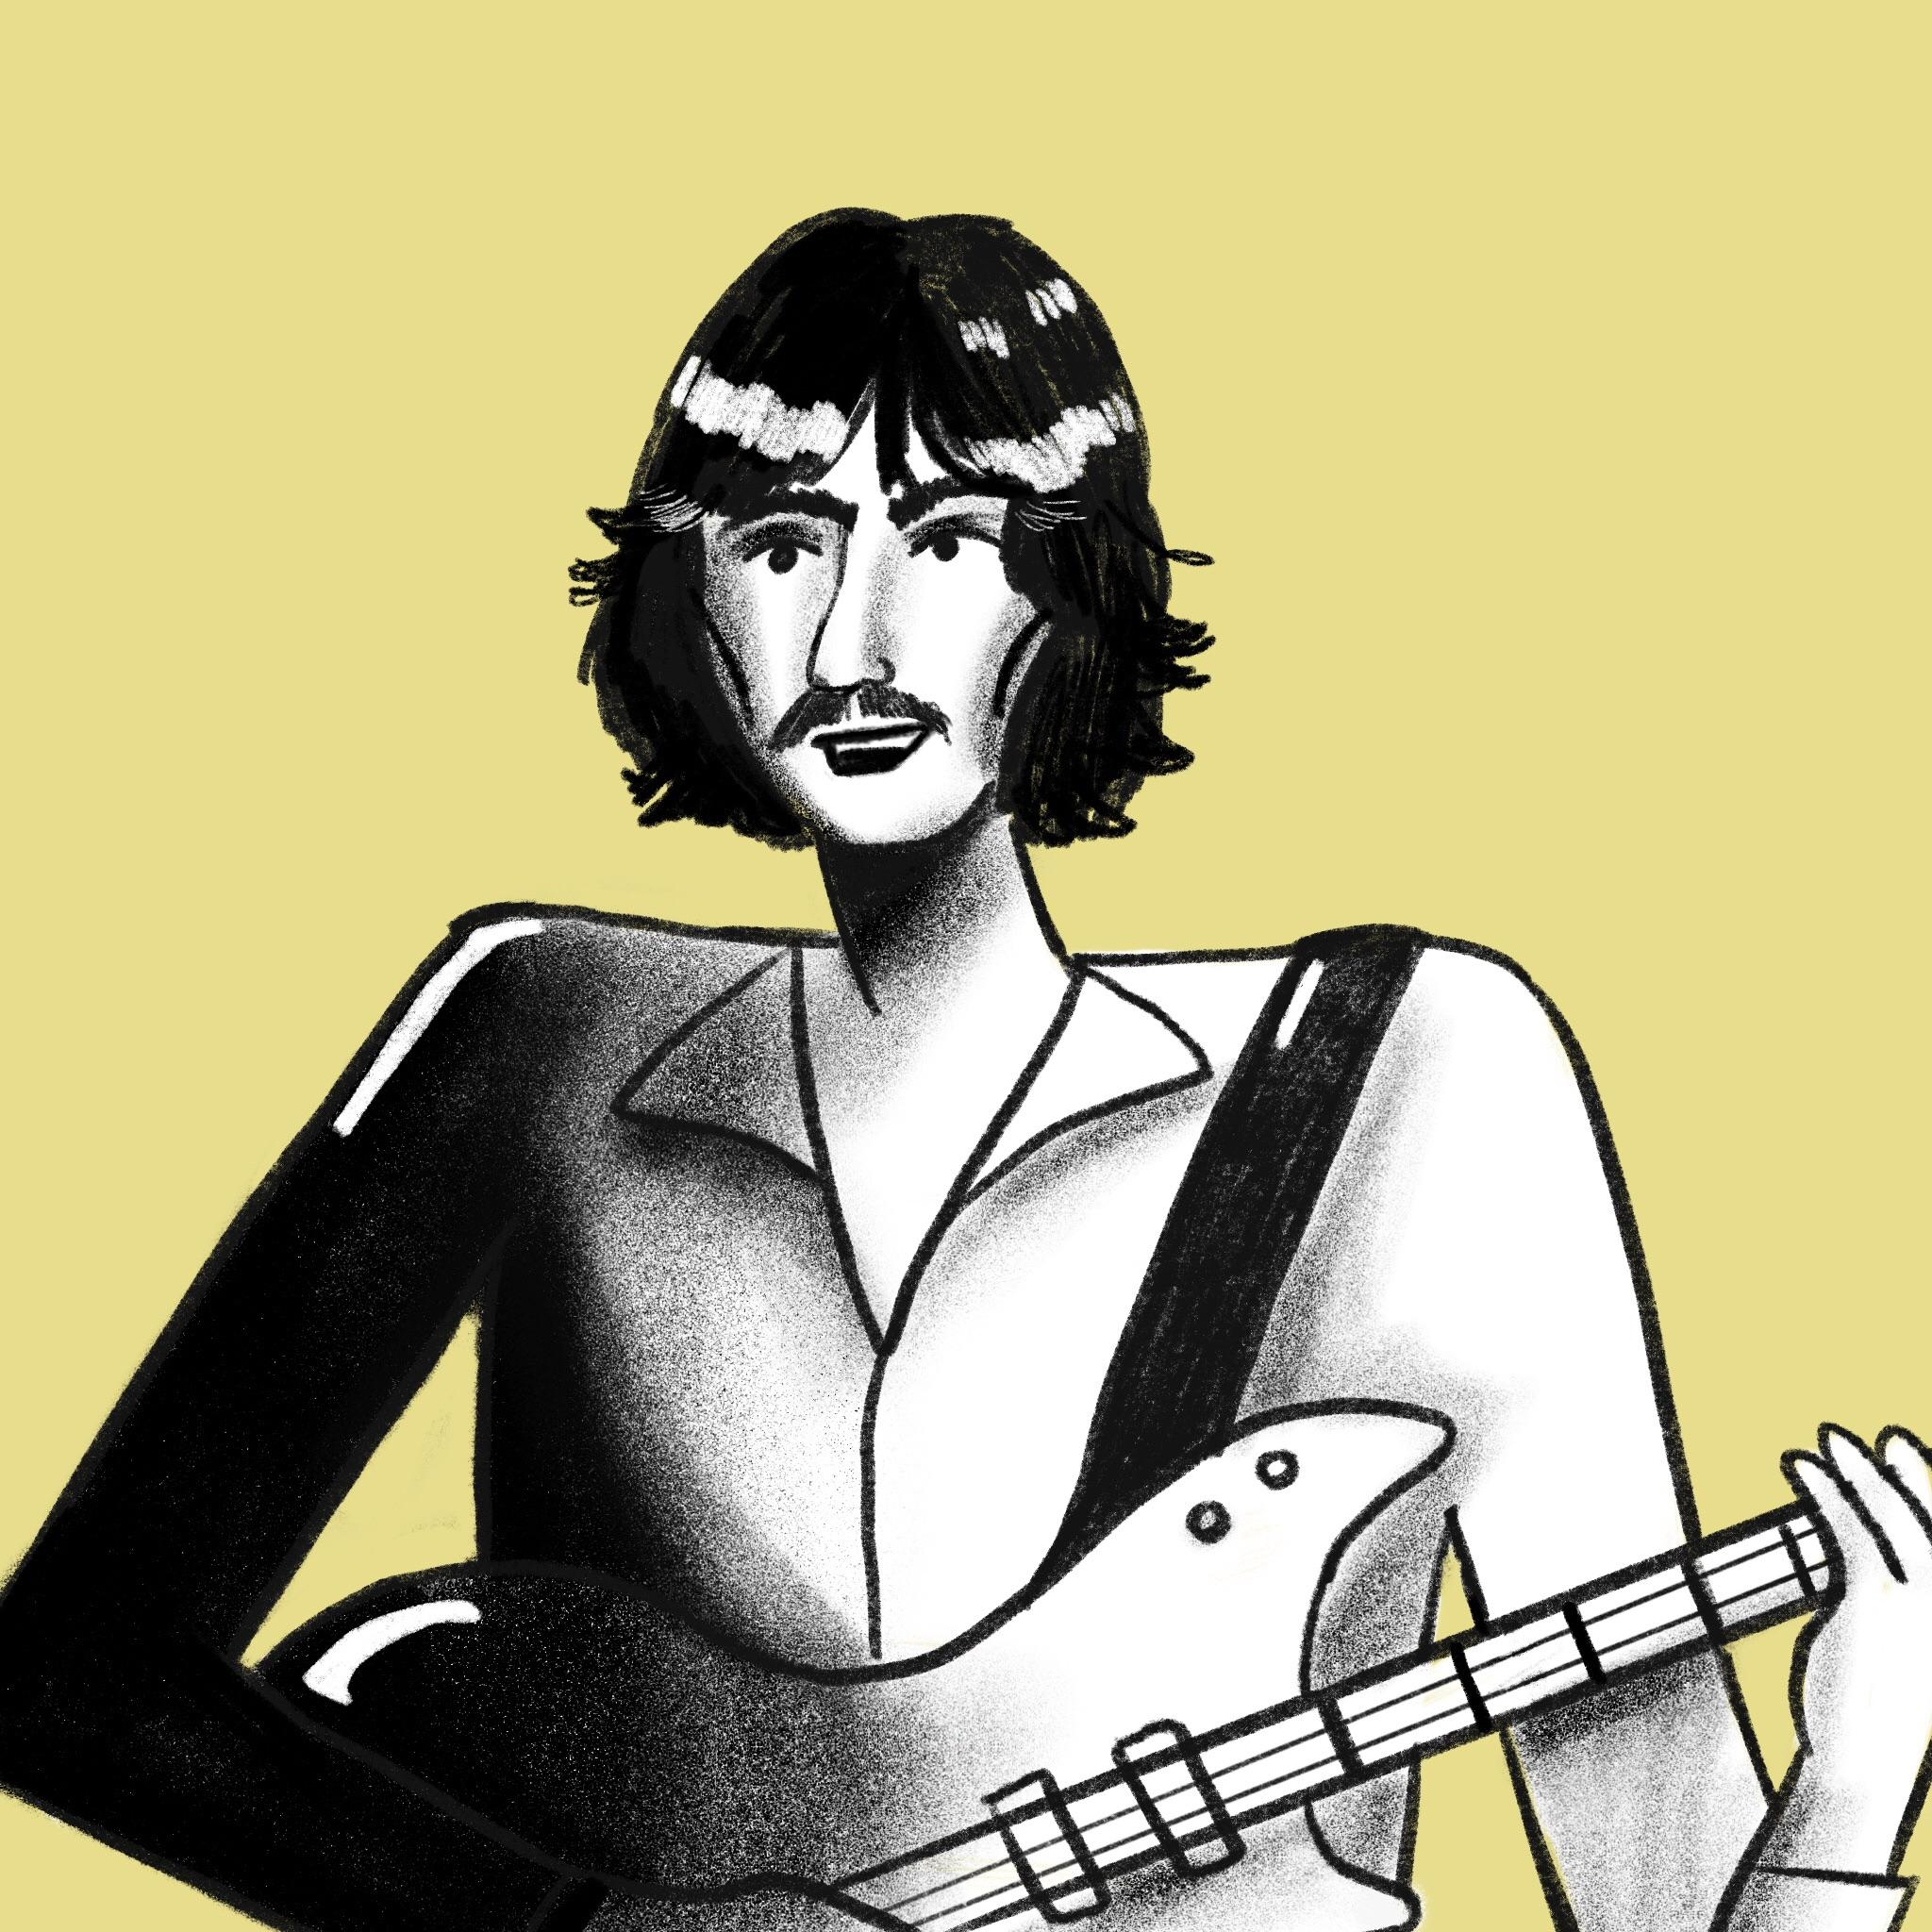 2048x2048 George Harrison Beatles